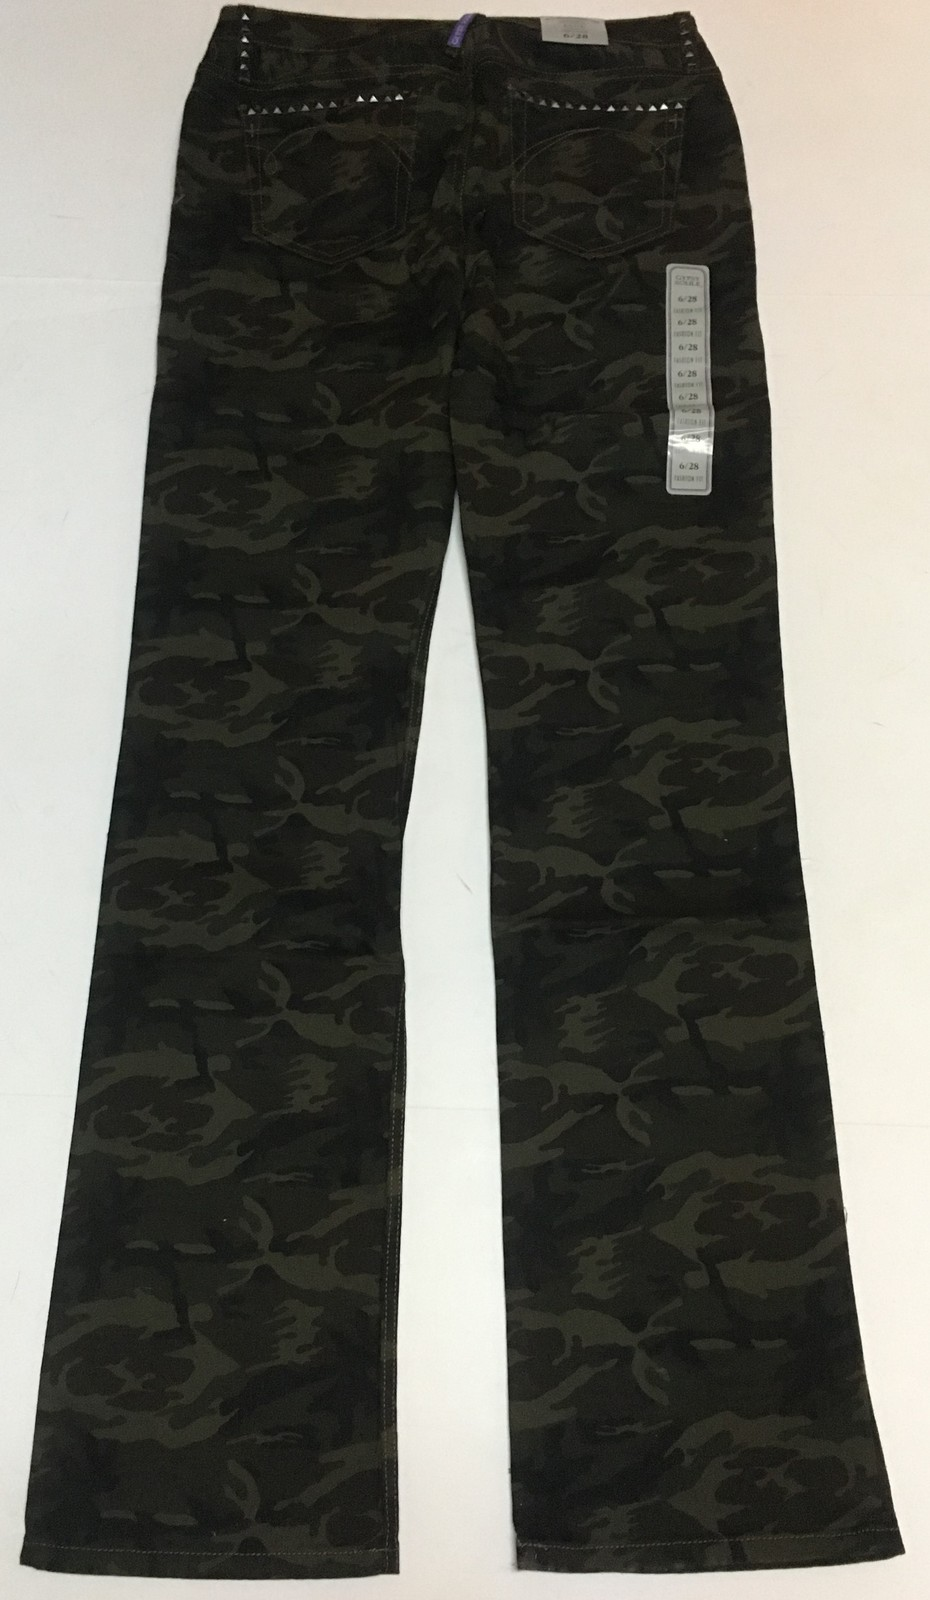 Gypsy Soule Camouflage Pants Jane Sz 6/28 NWT image 7